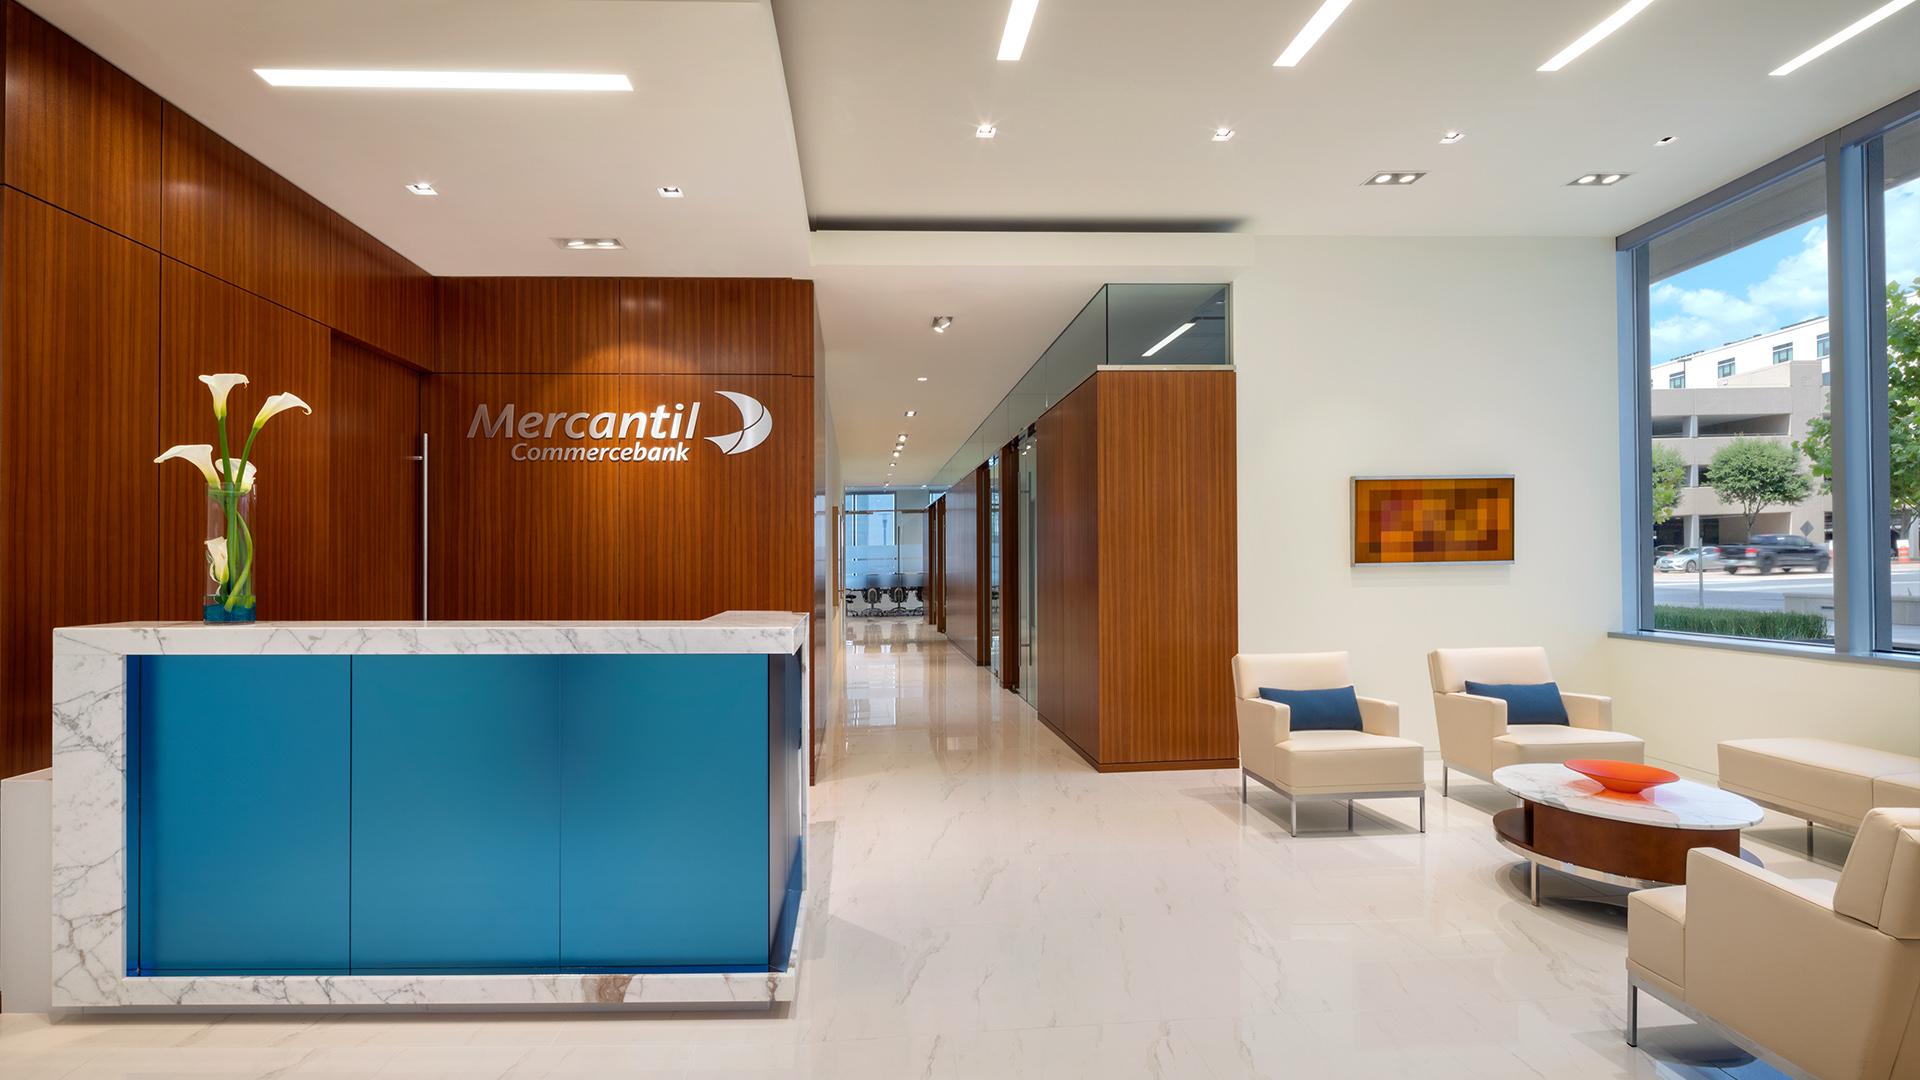 Financial Retail Interior Design Mercantil Commercebank Champions Louetta Reception Lobby